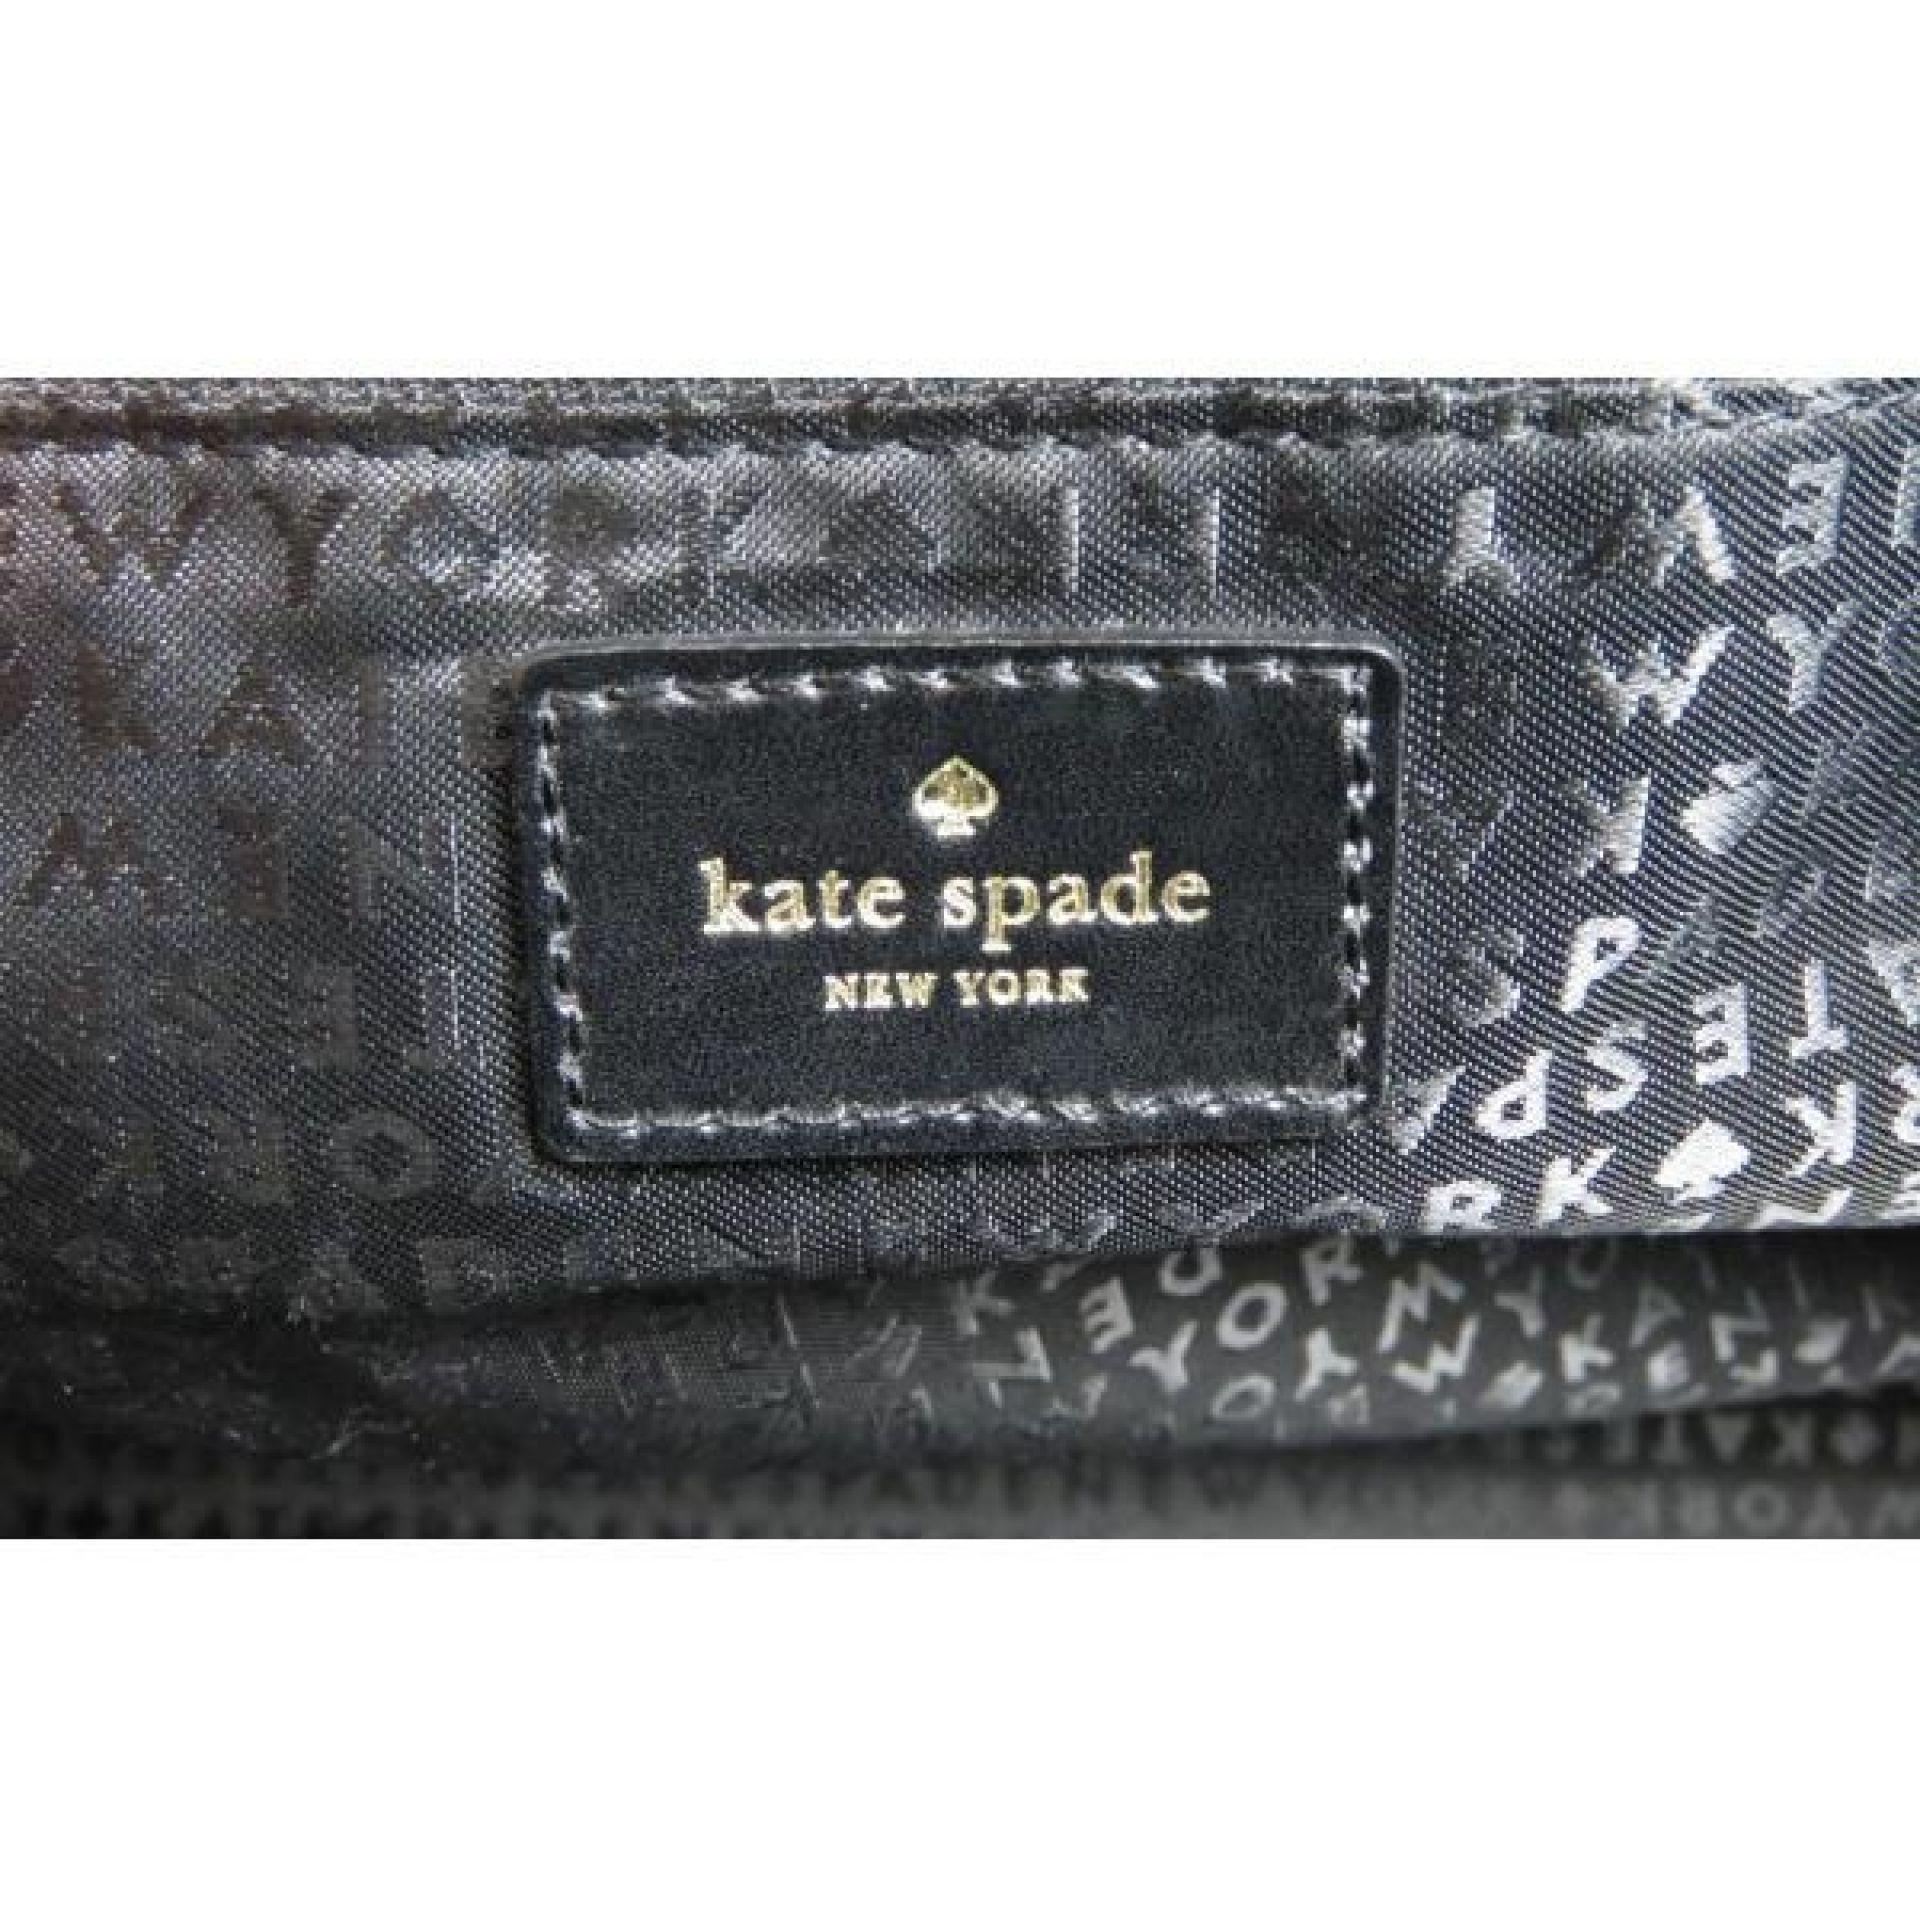 Kate Spade Black Lizard Embossed Leather Alavita Halsey Tote Bag